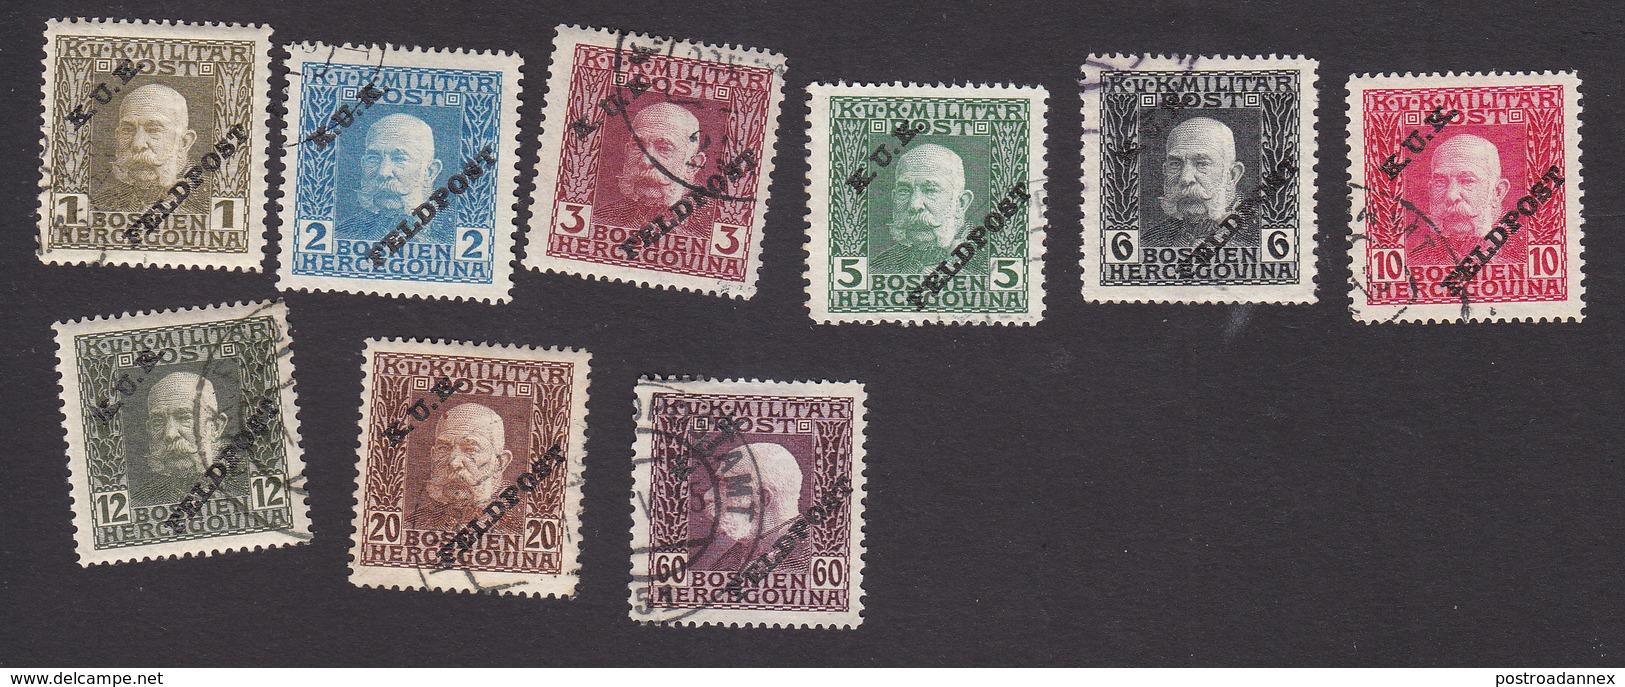 Austria, Scott #M1-M8, M15, Used, Bosnia Stamps Of Franz Josef Overprinted, Issued 1915 - Austria